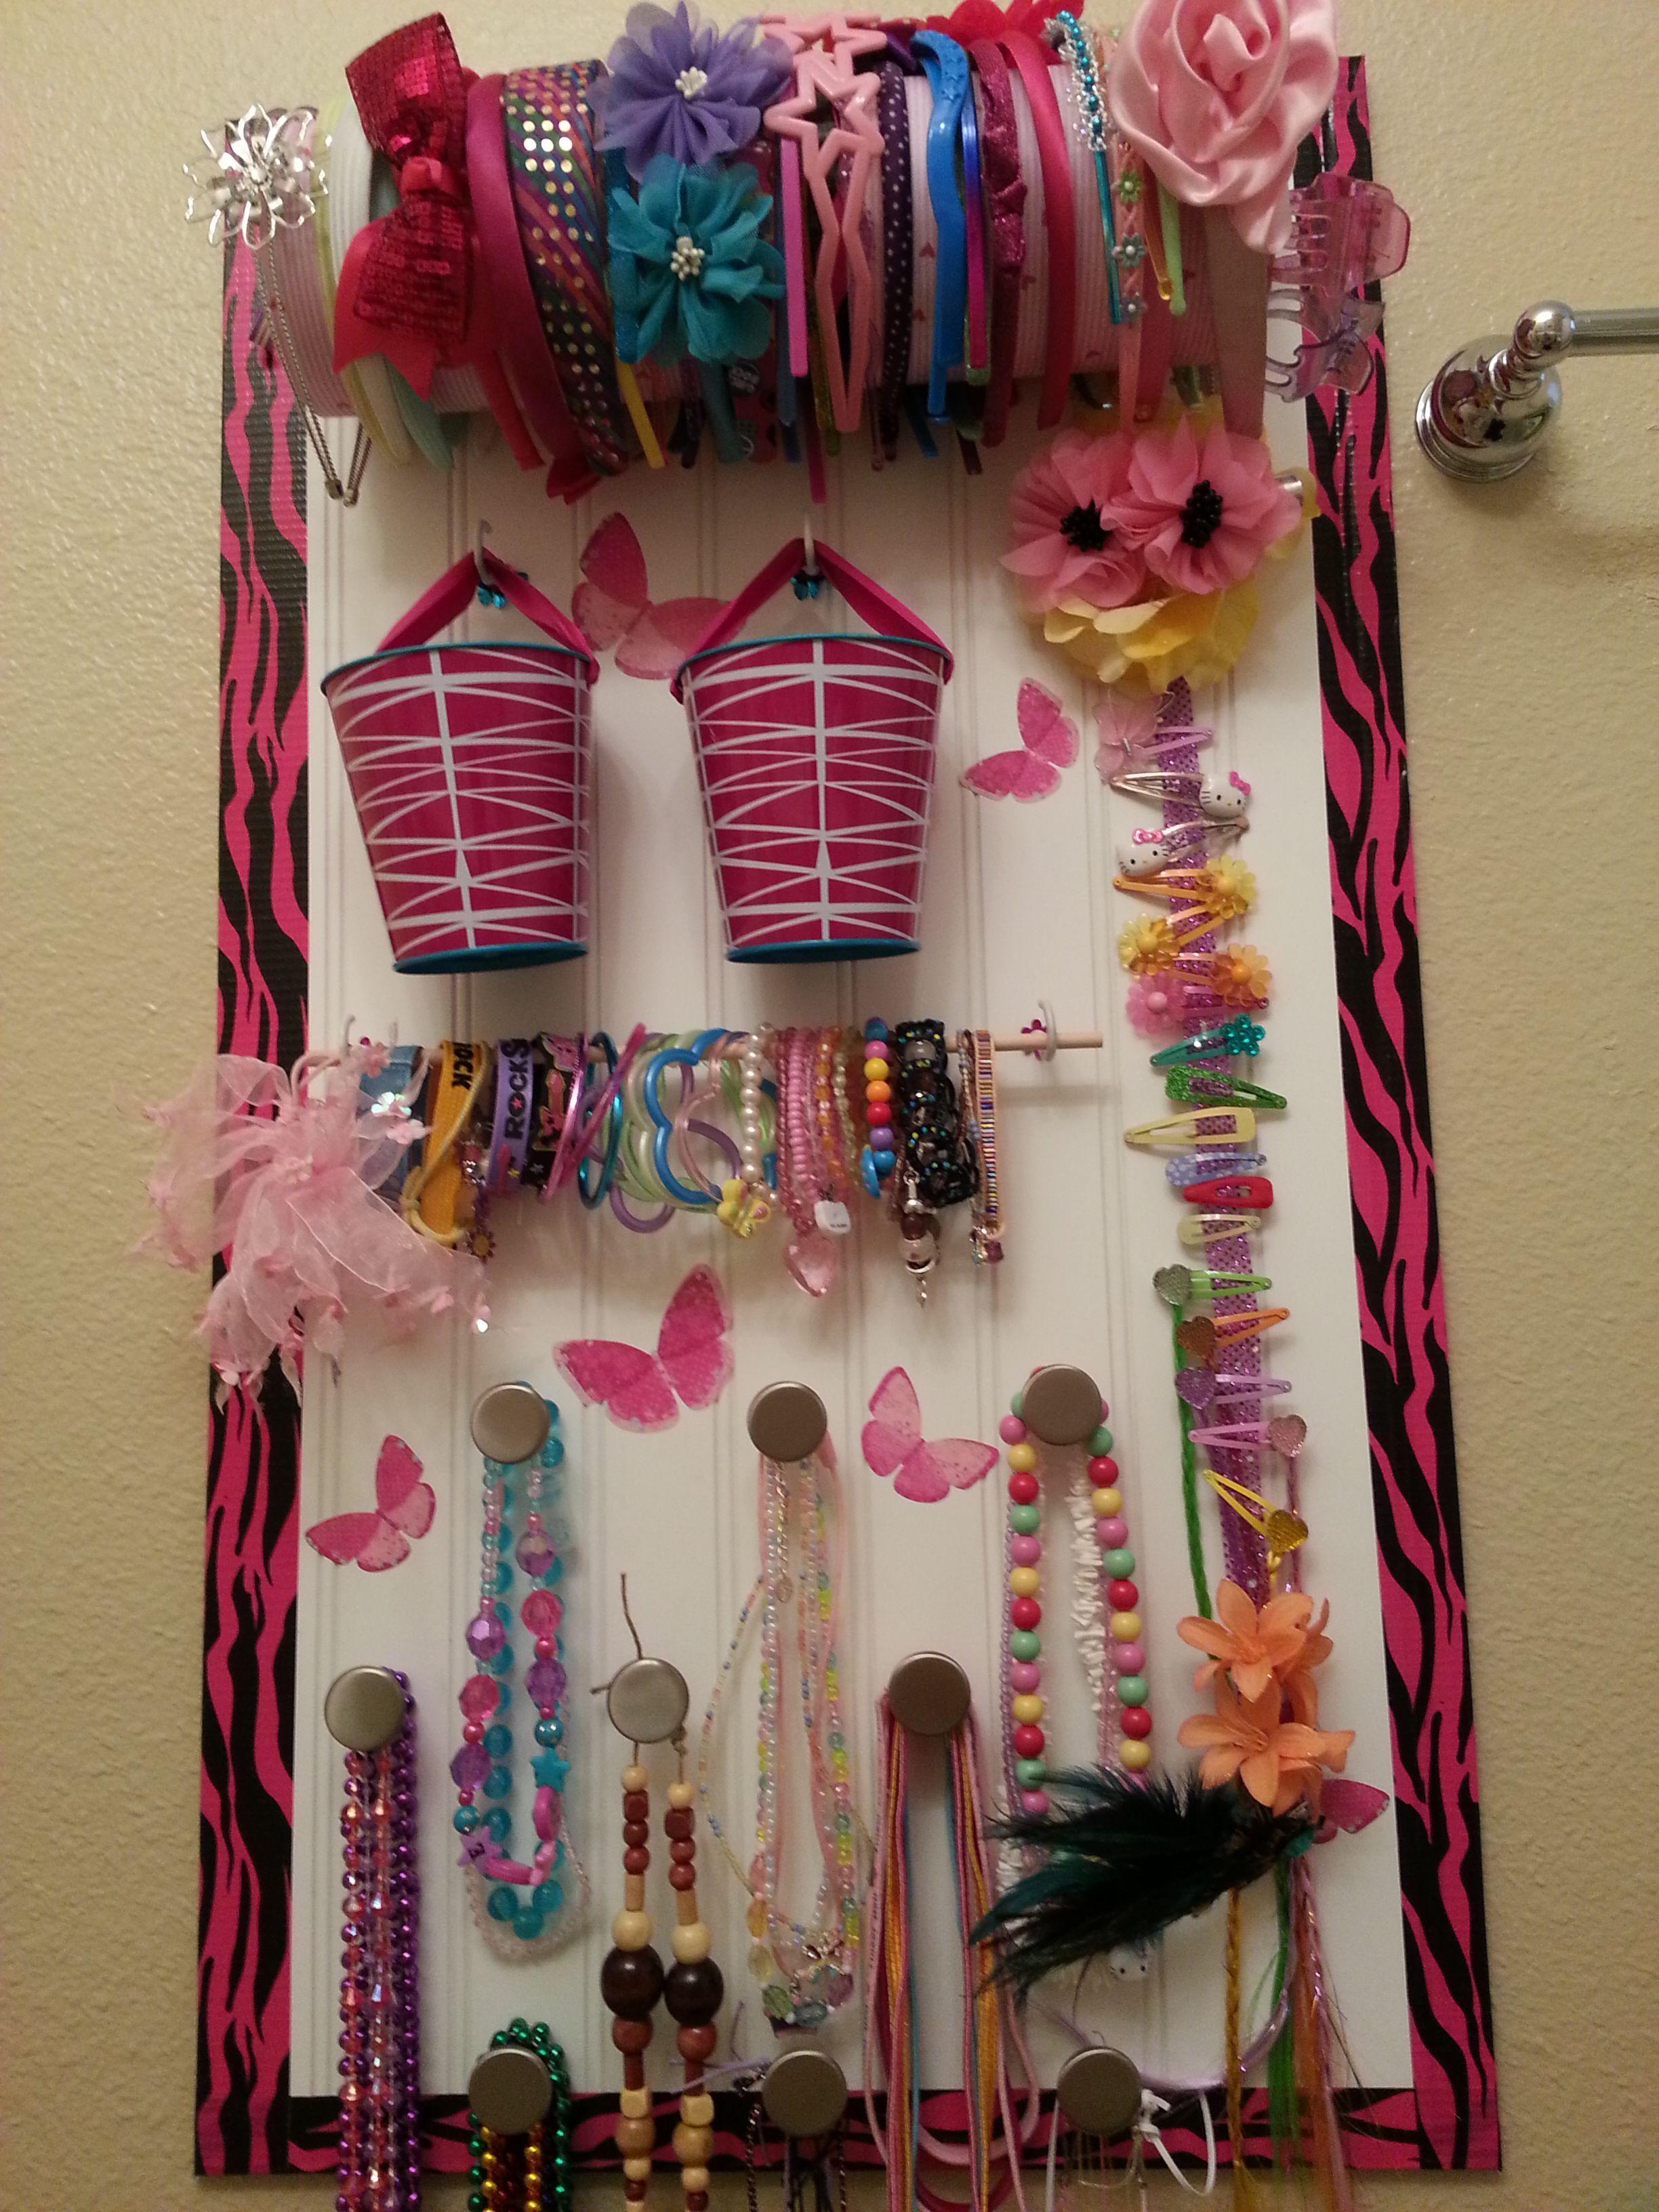 Girls hair accessory organizer.